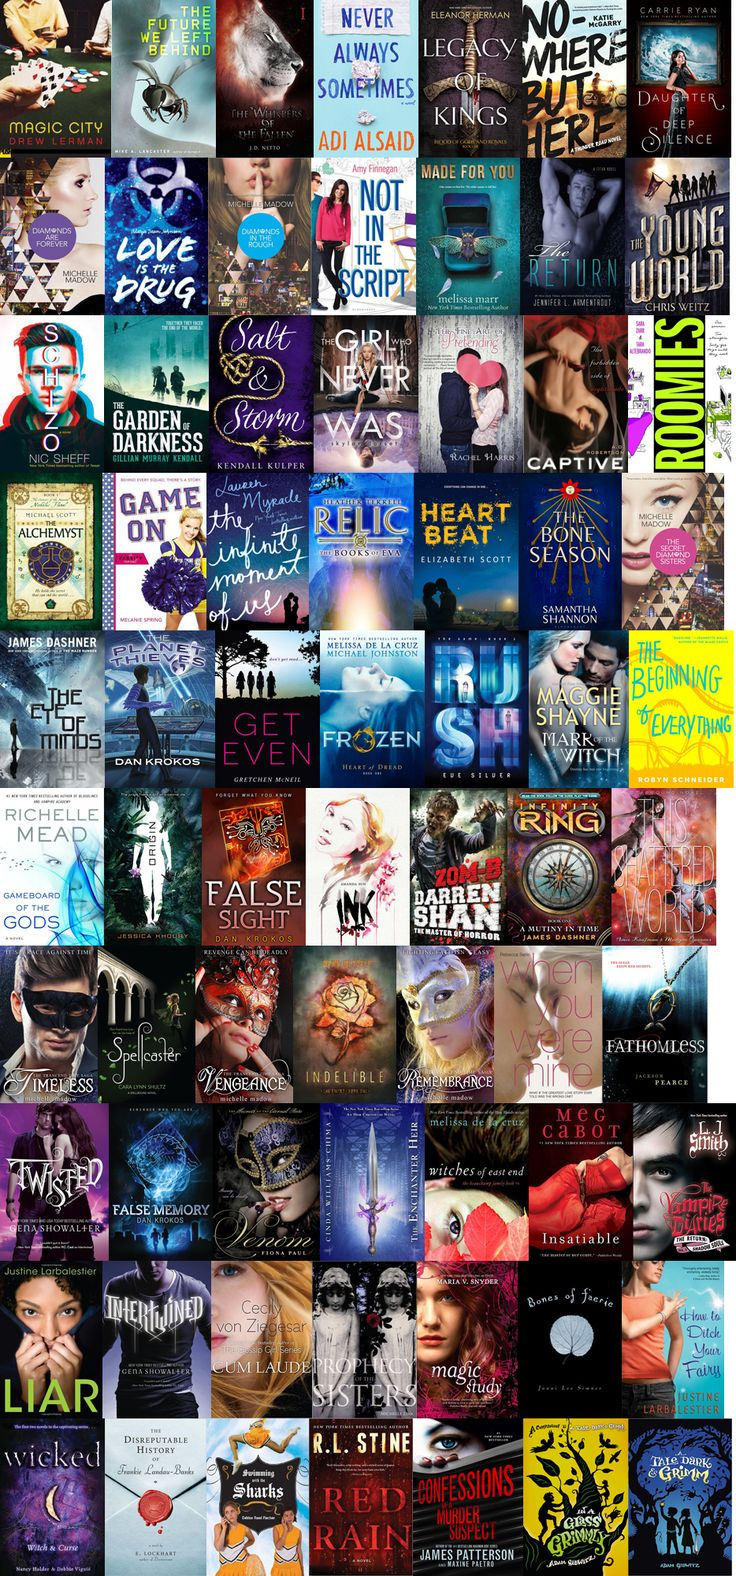 MEGA Box of 70 YA Books #Giveaway! http://michellemadow.com/giveaways/mega-box-of-70-ya-books-giveaway?lucky=2122